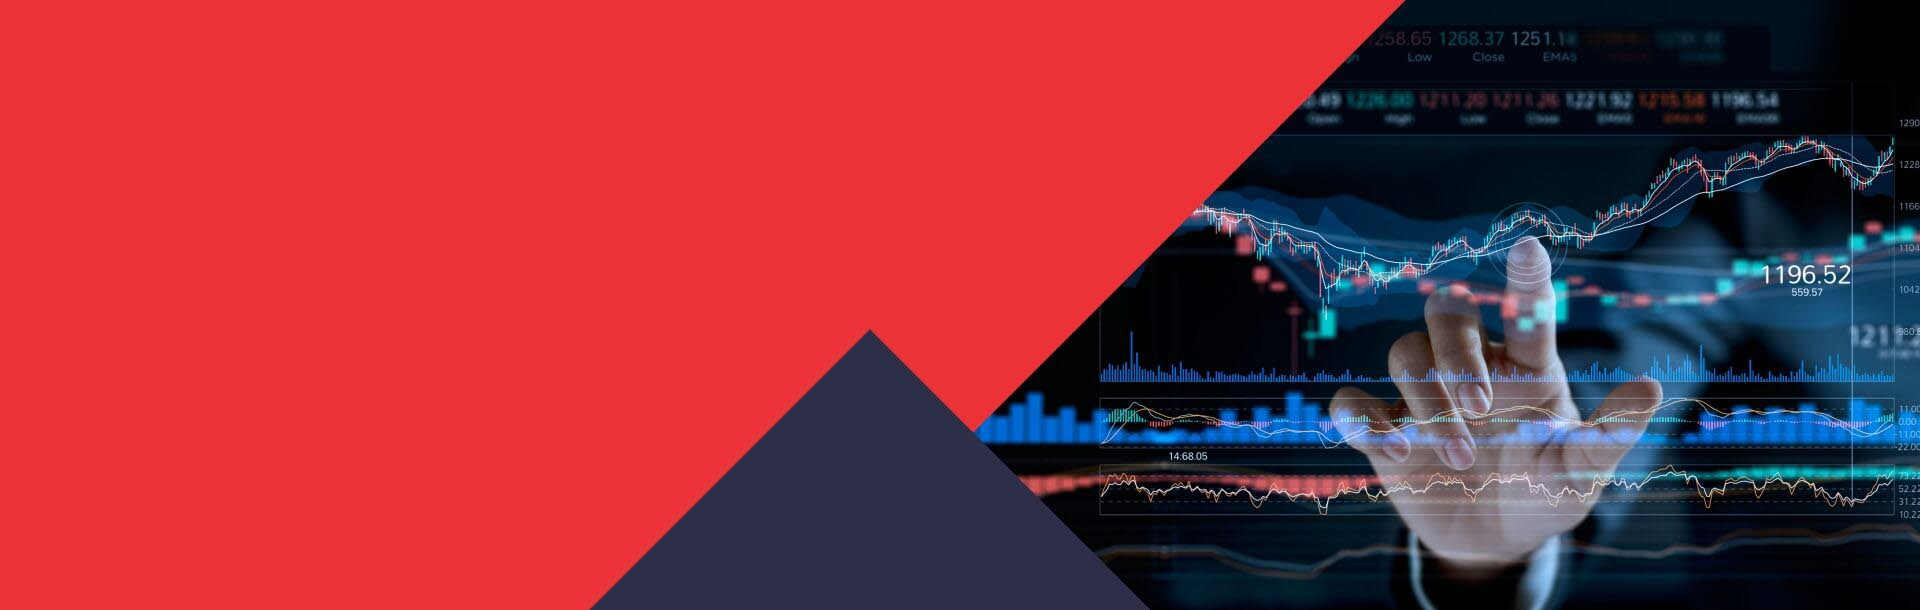 Banner horizontal finanzas 28 10 19